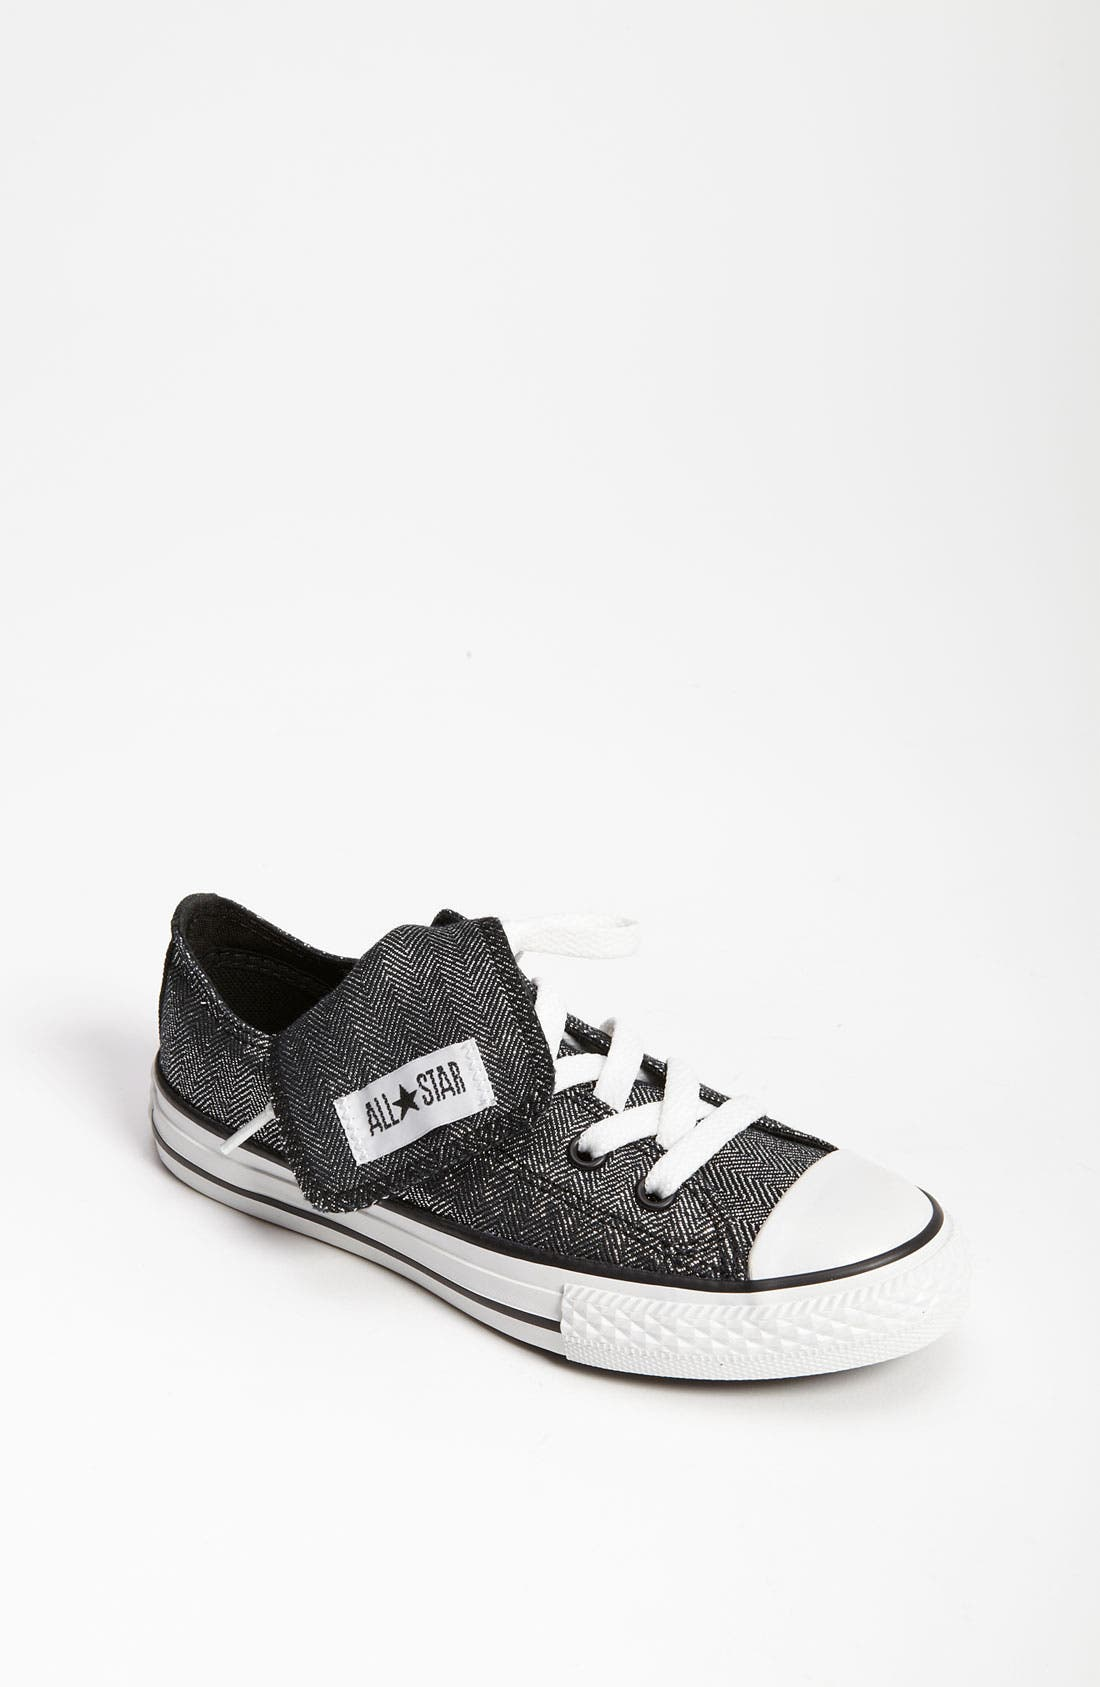 Main Image - Converse 'Sparkle' Mega Tongue Sneaker (Toddler, Little Kid & Big Kid)